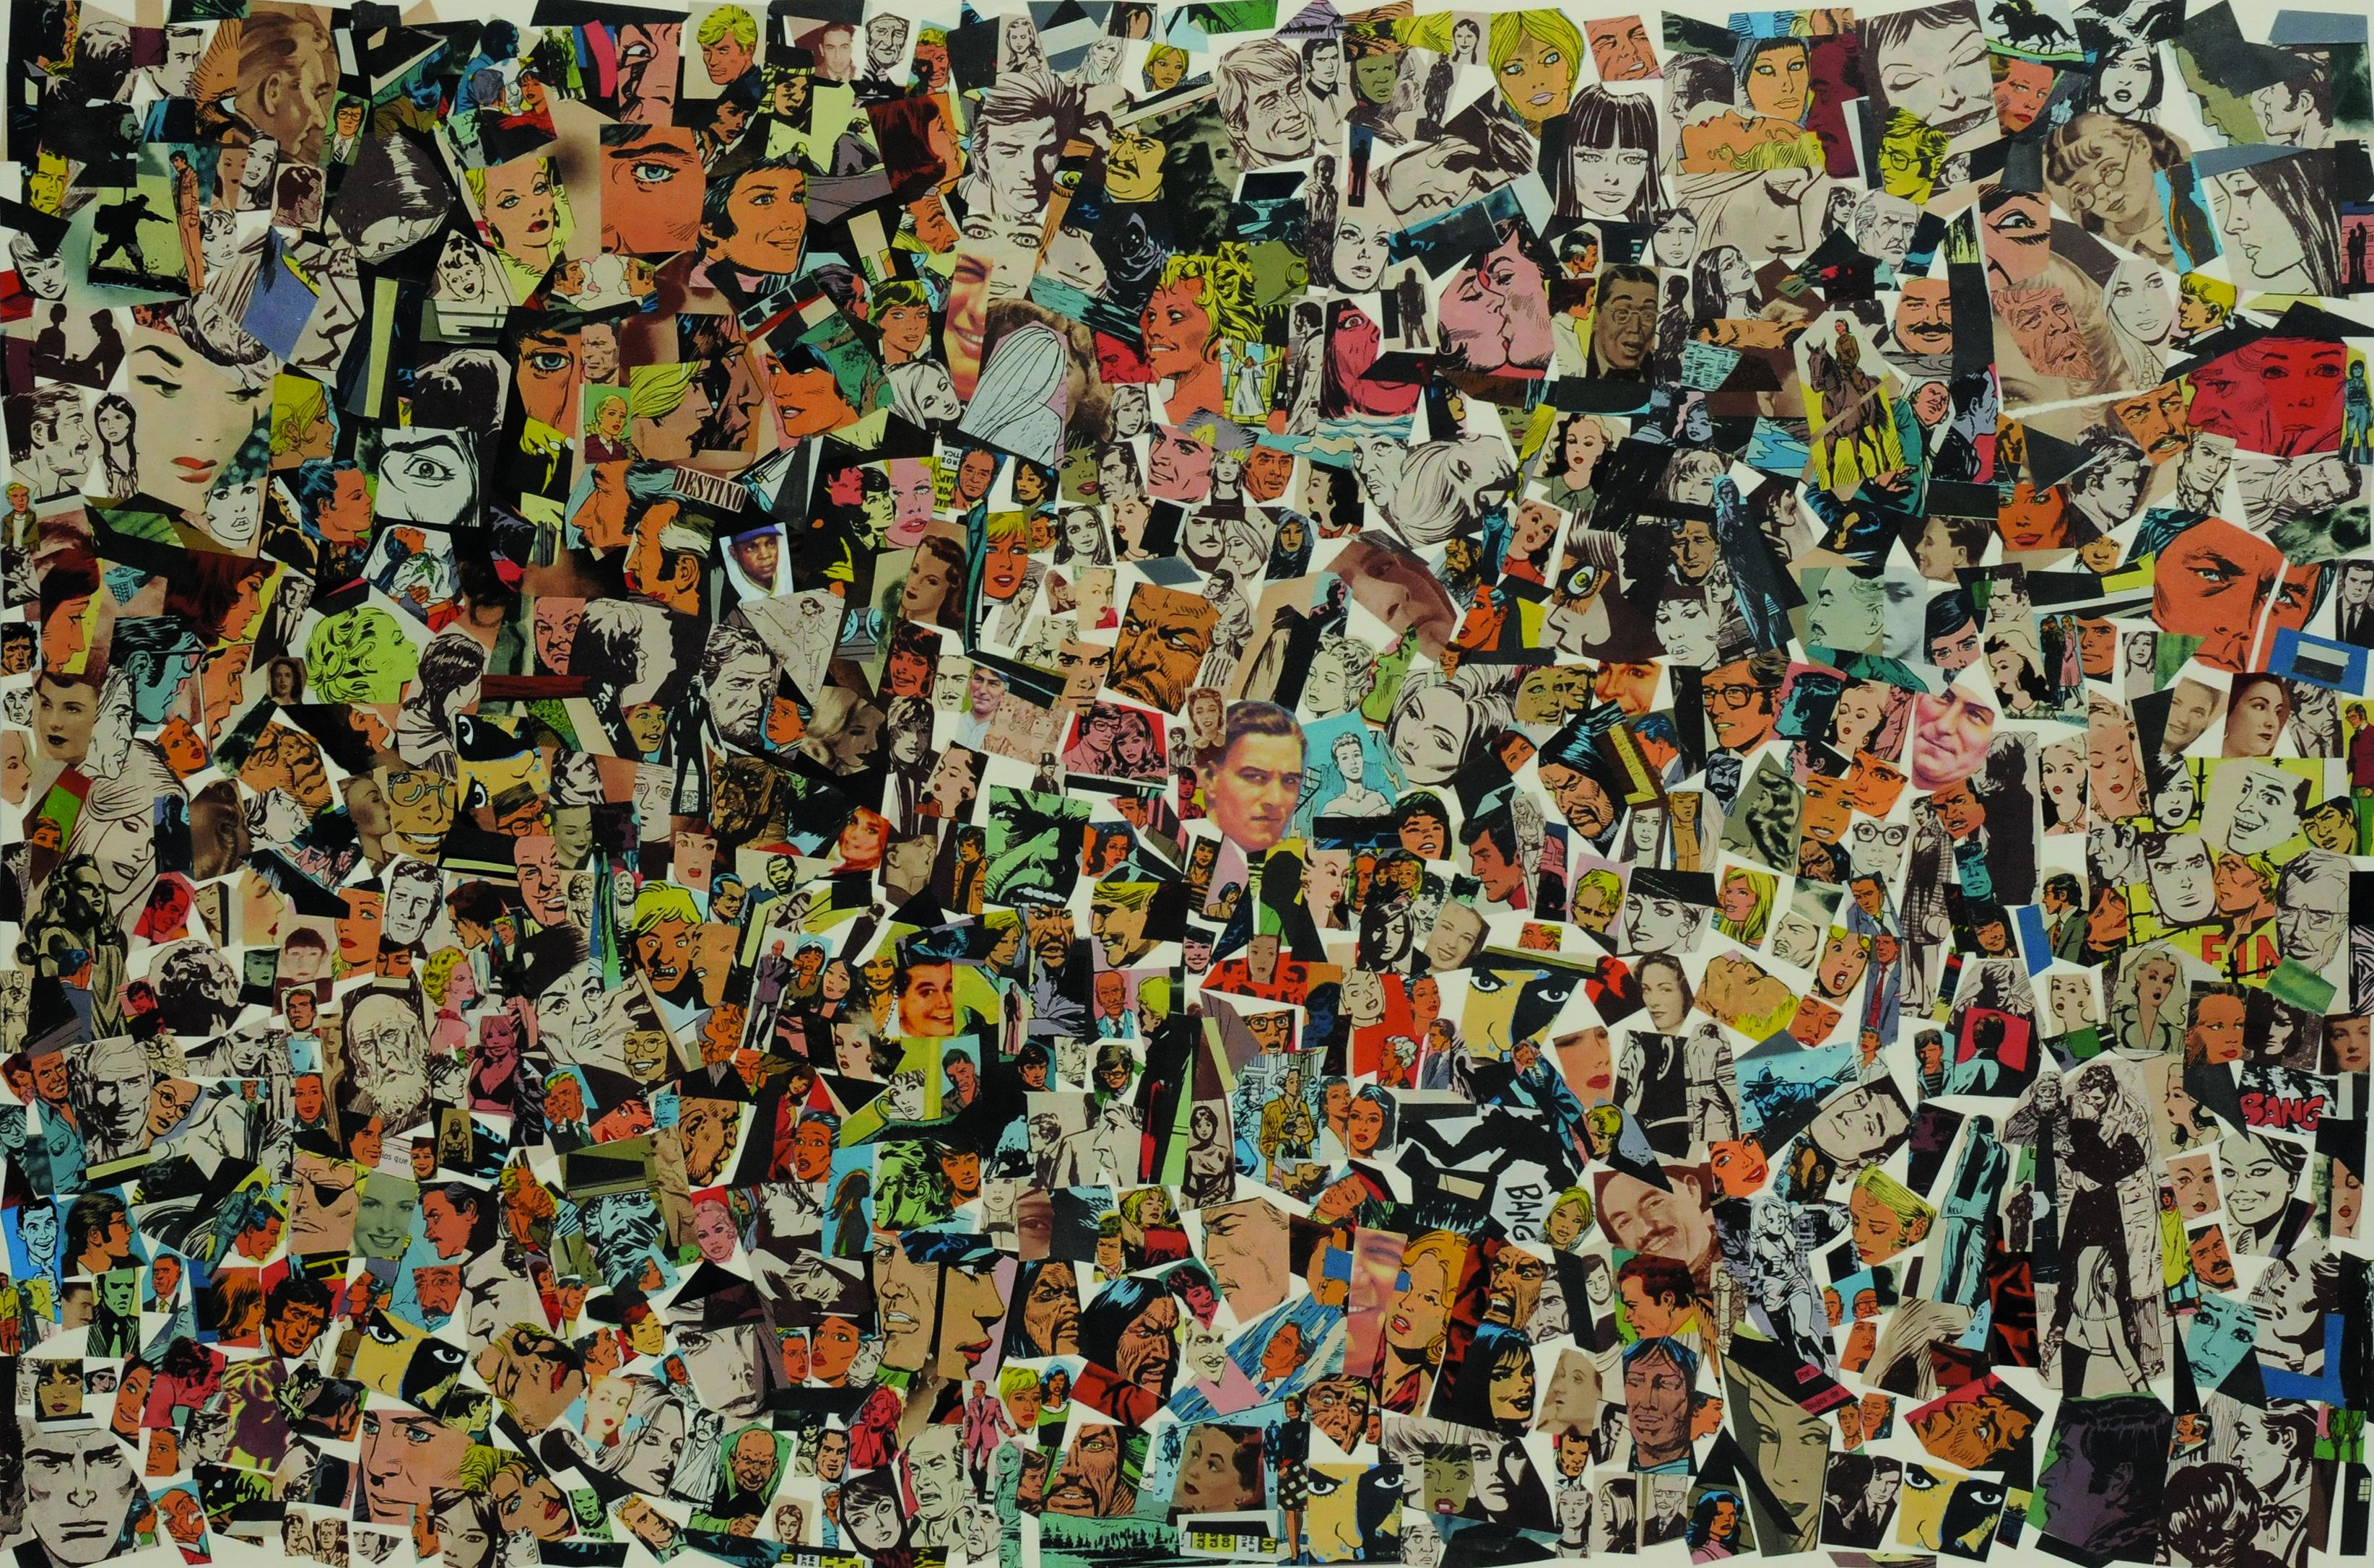 Destino I, papel collage, 51 cm x 76 cm. 2008